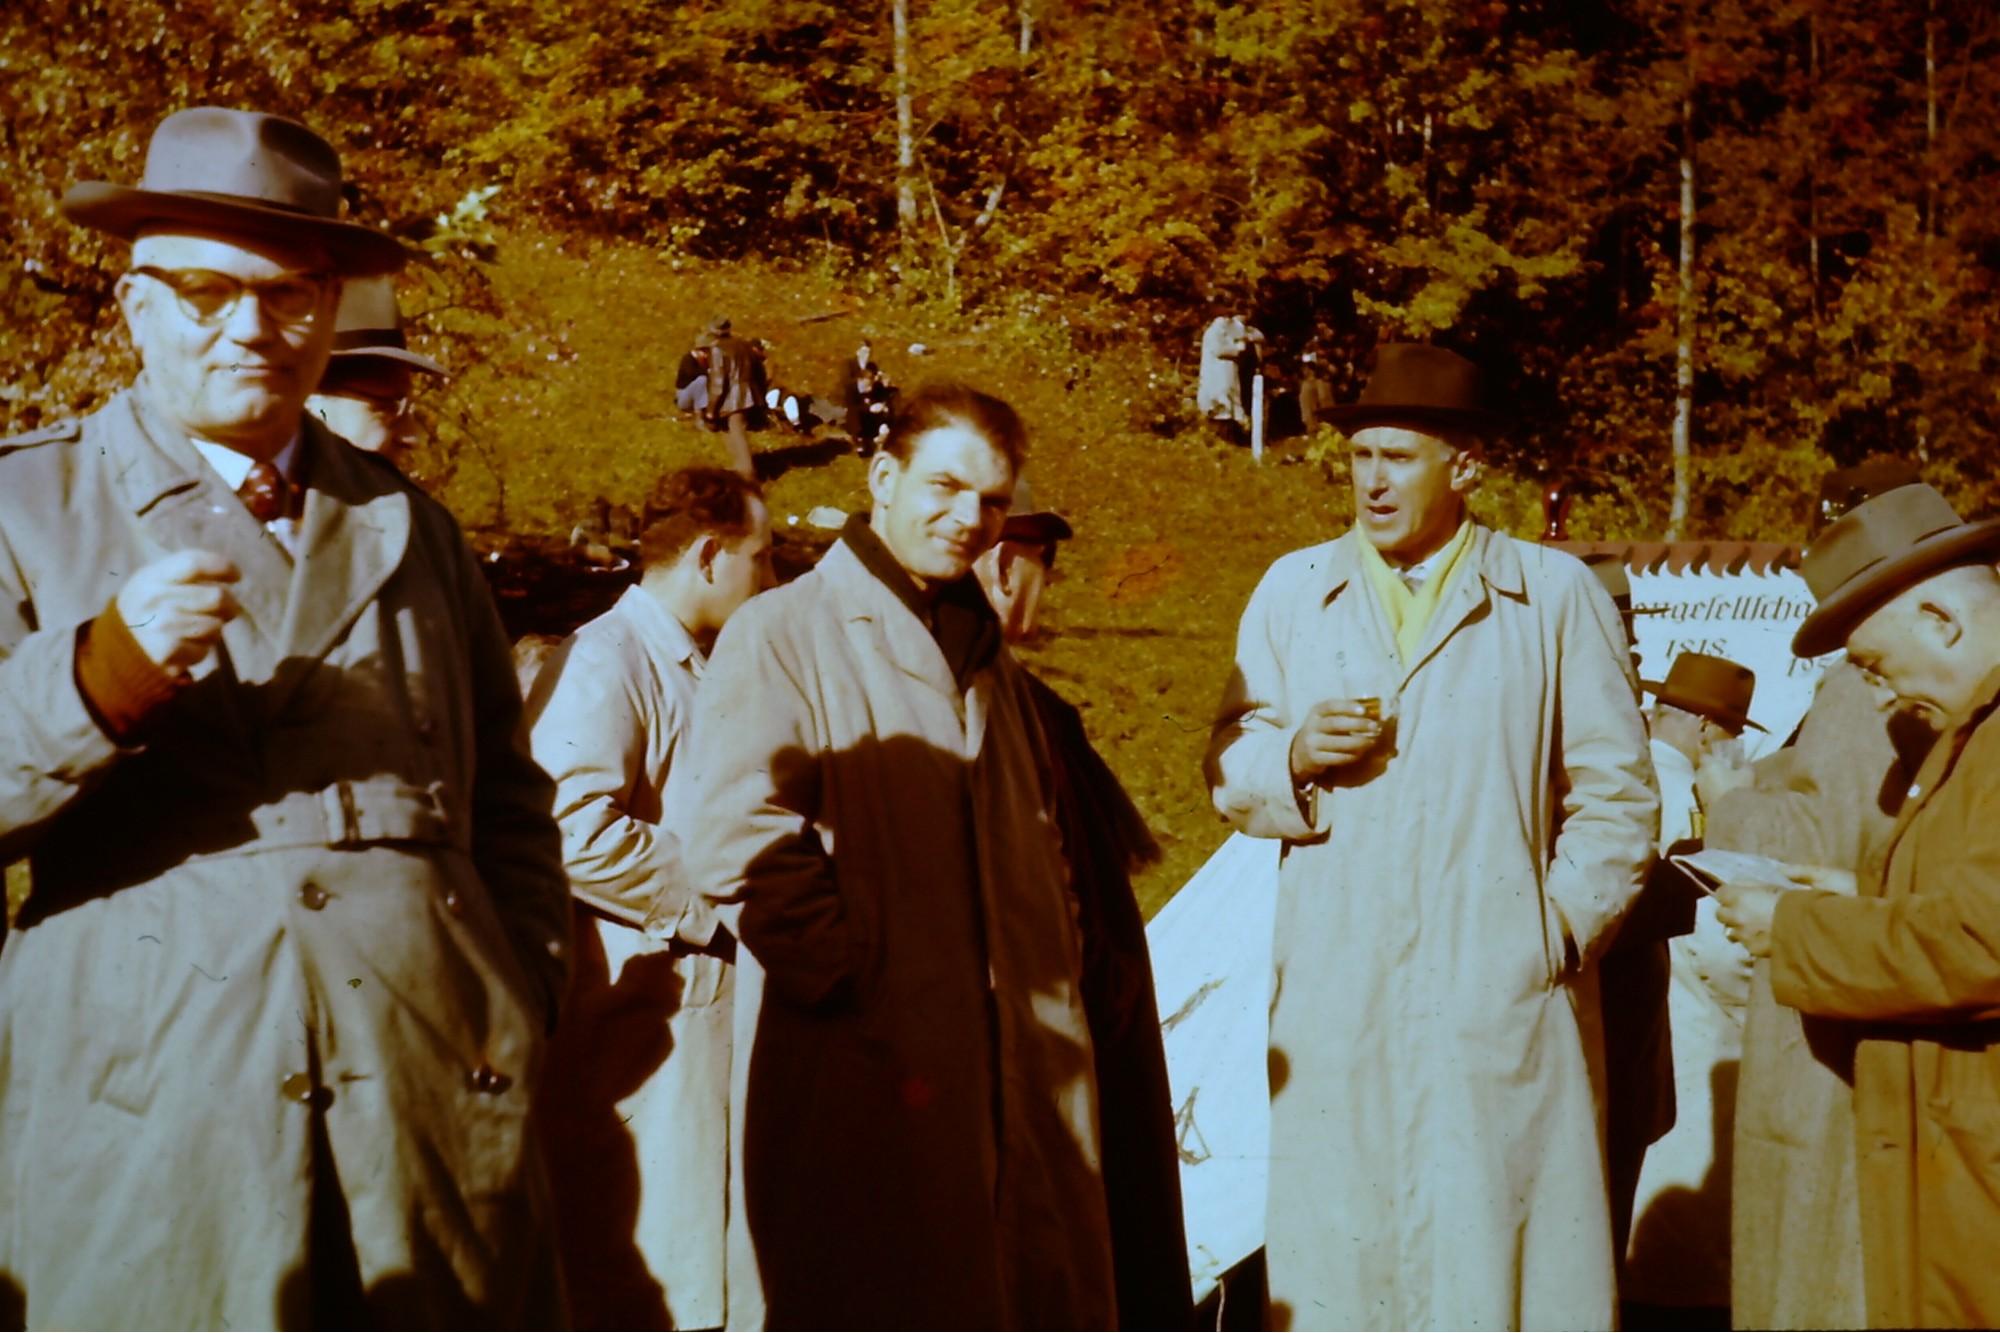 Die Feuerschützen am Rütli 1956